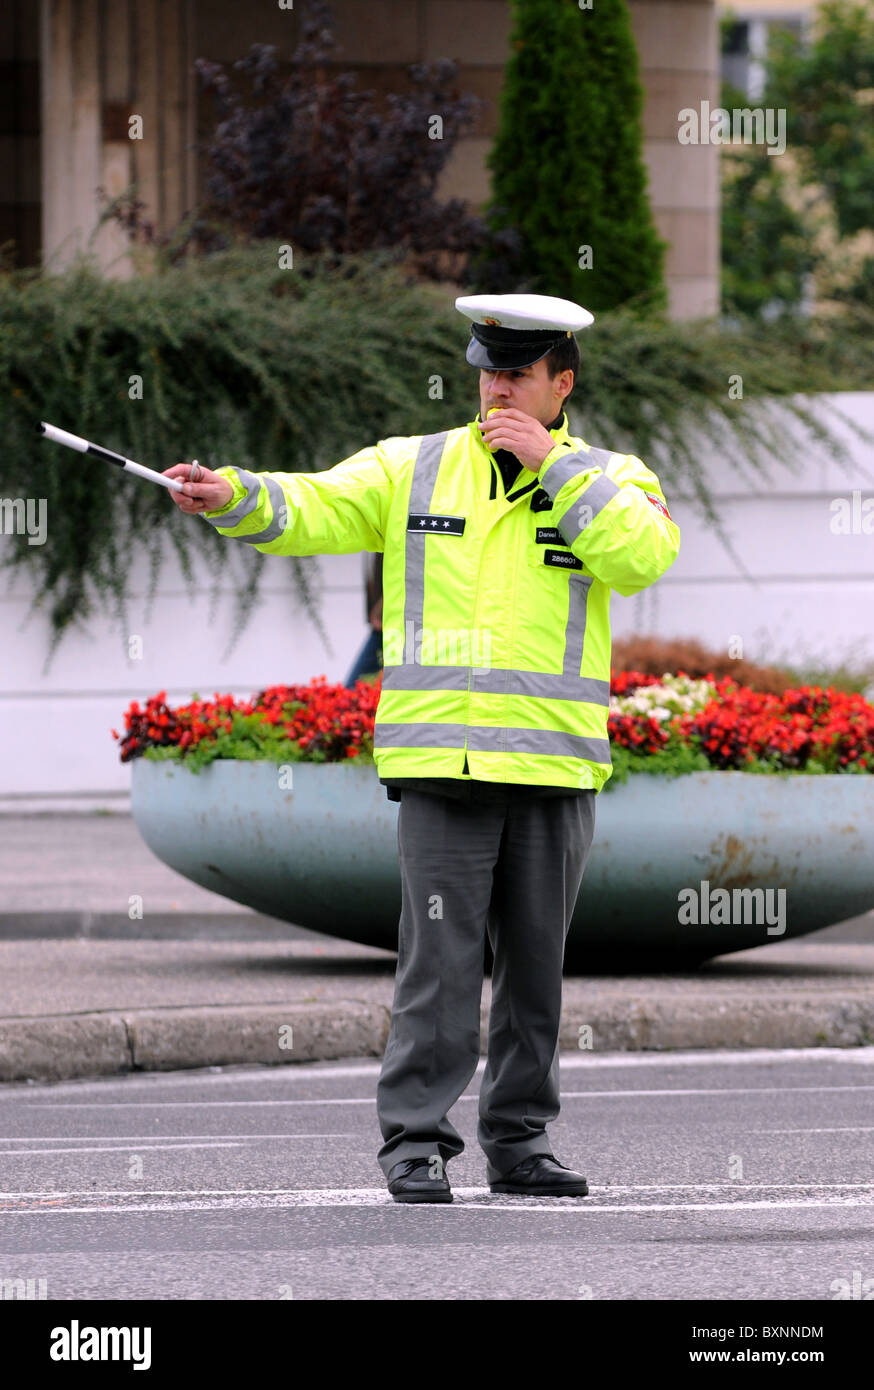 Le trafic de contrôle policier, Bratislava, Slovaquie, Europe Photo Stock